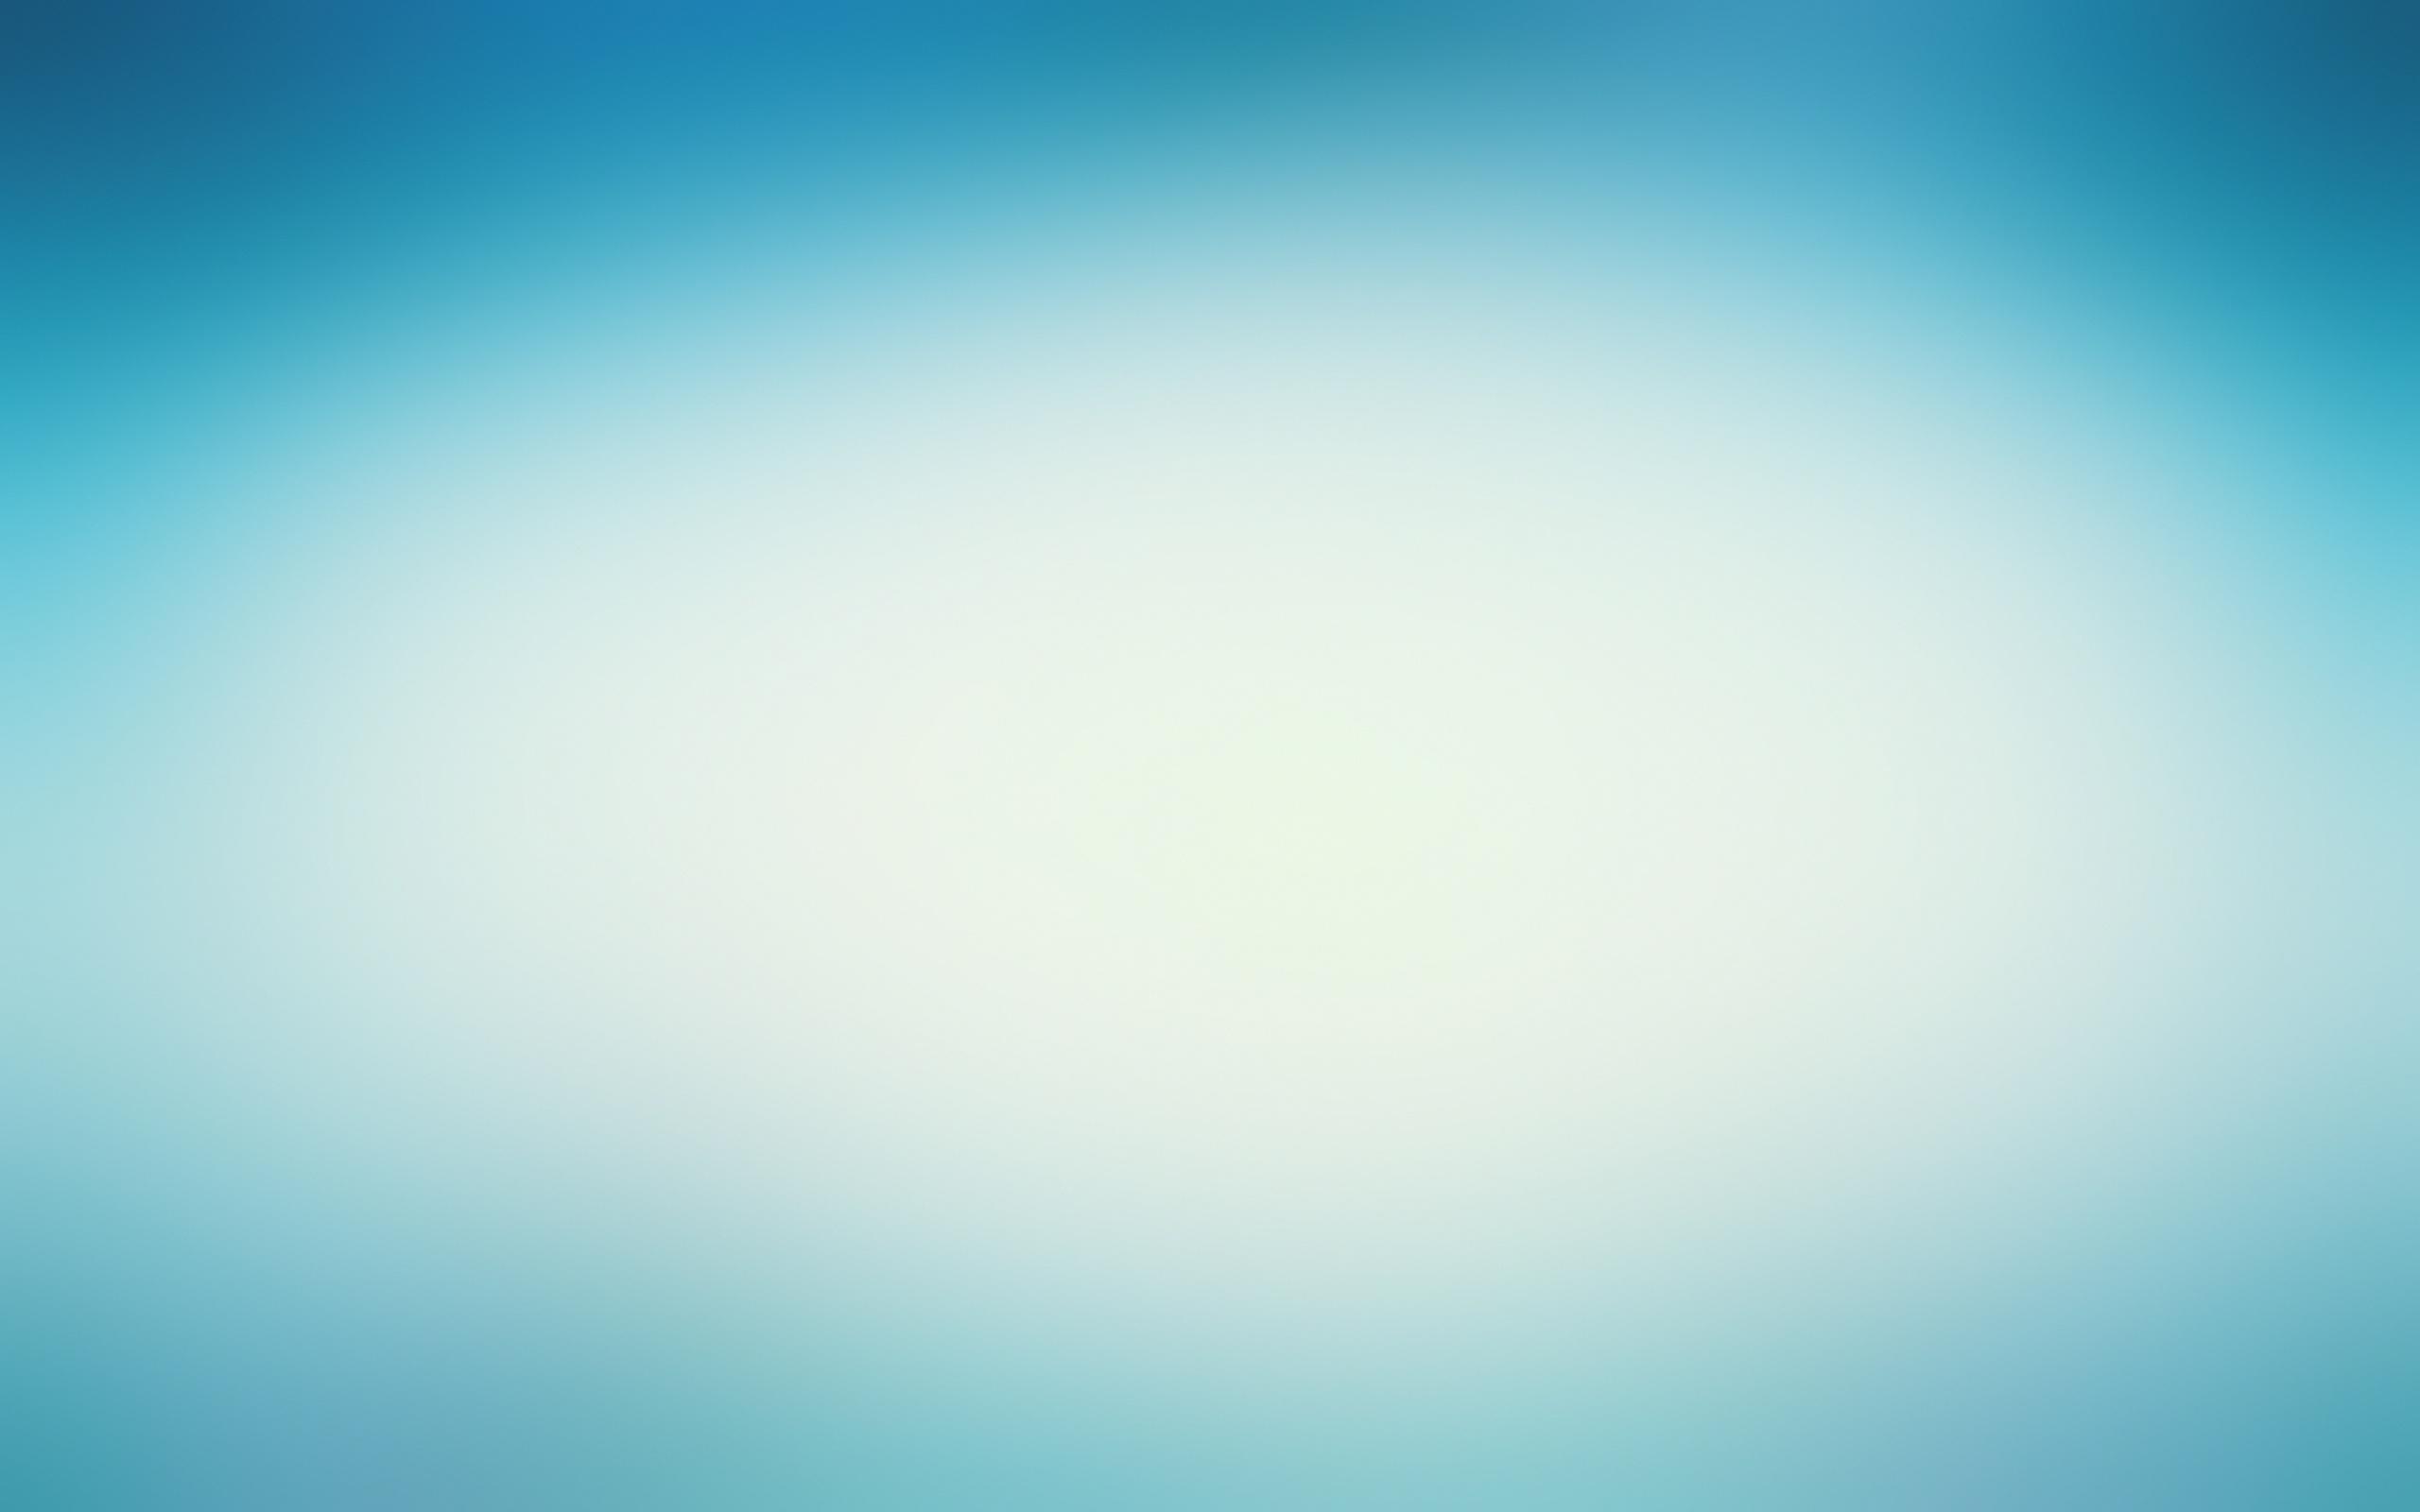 Alien_Ink_2560X1600_Abstract_Background_1.jpg